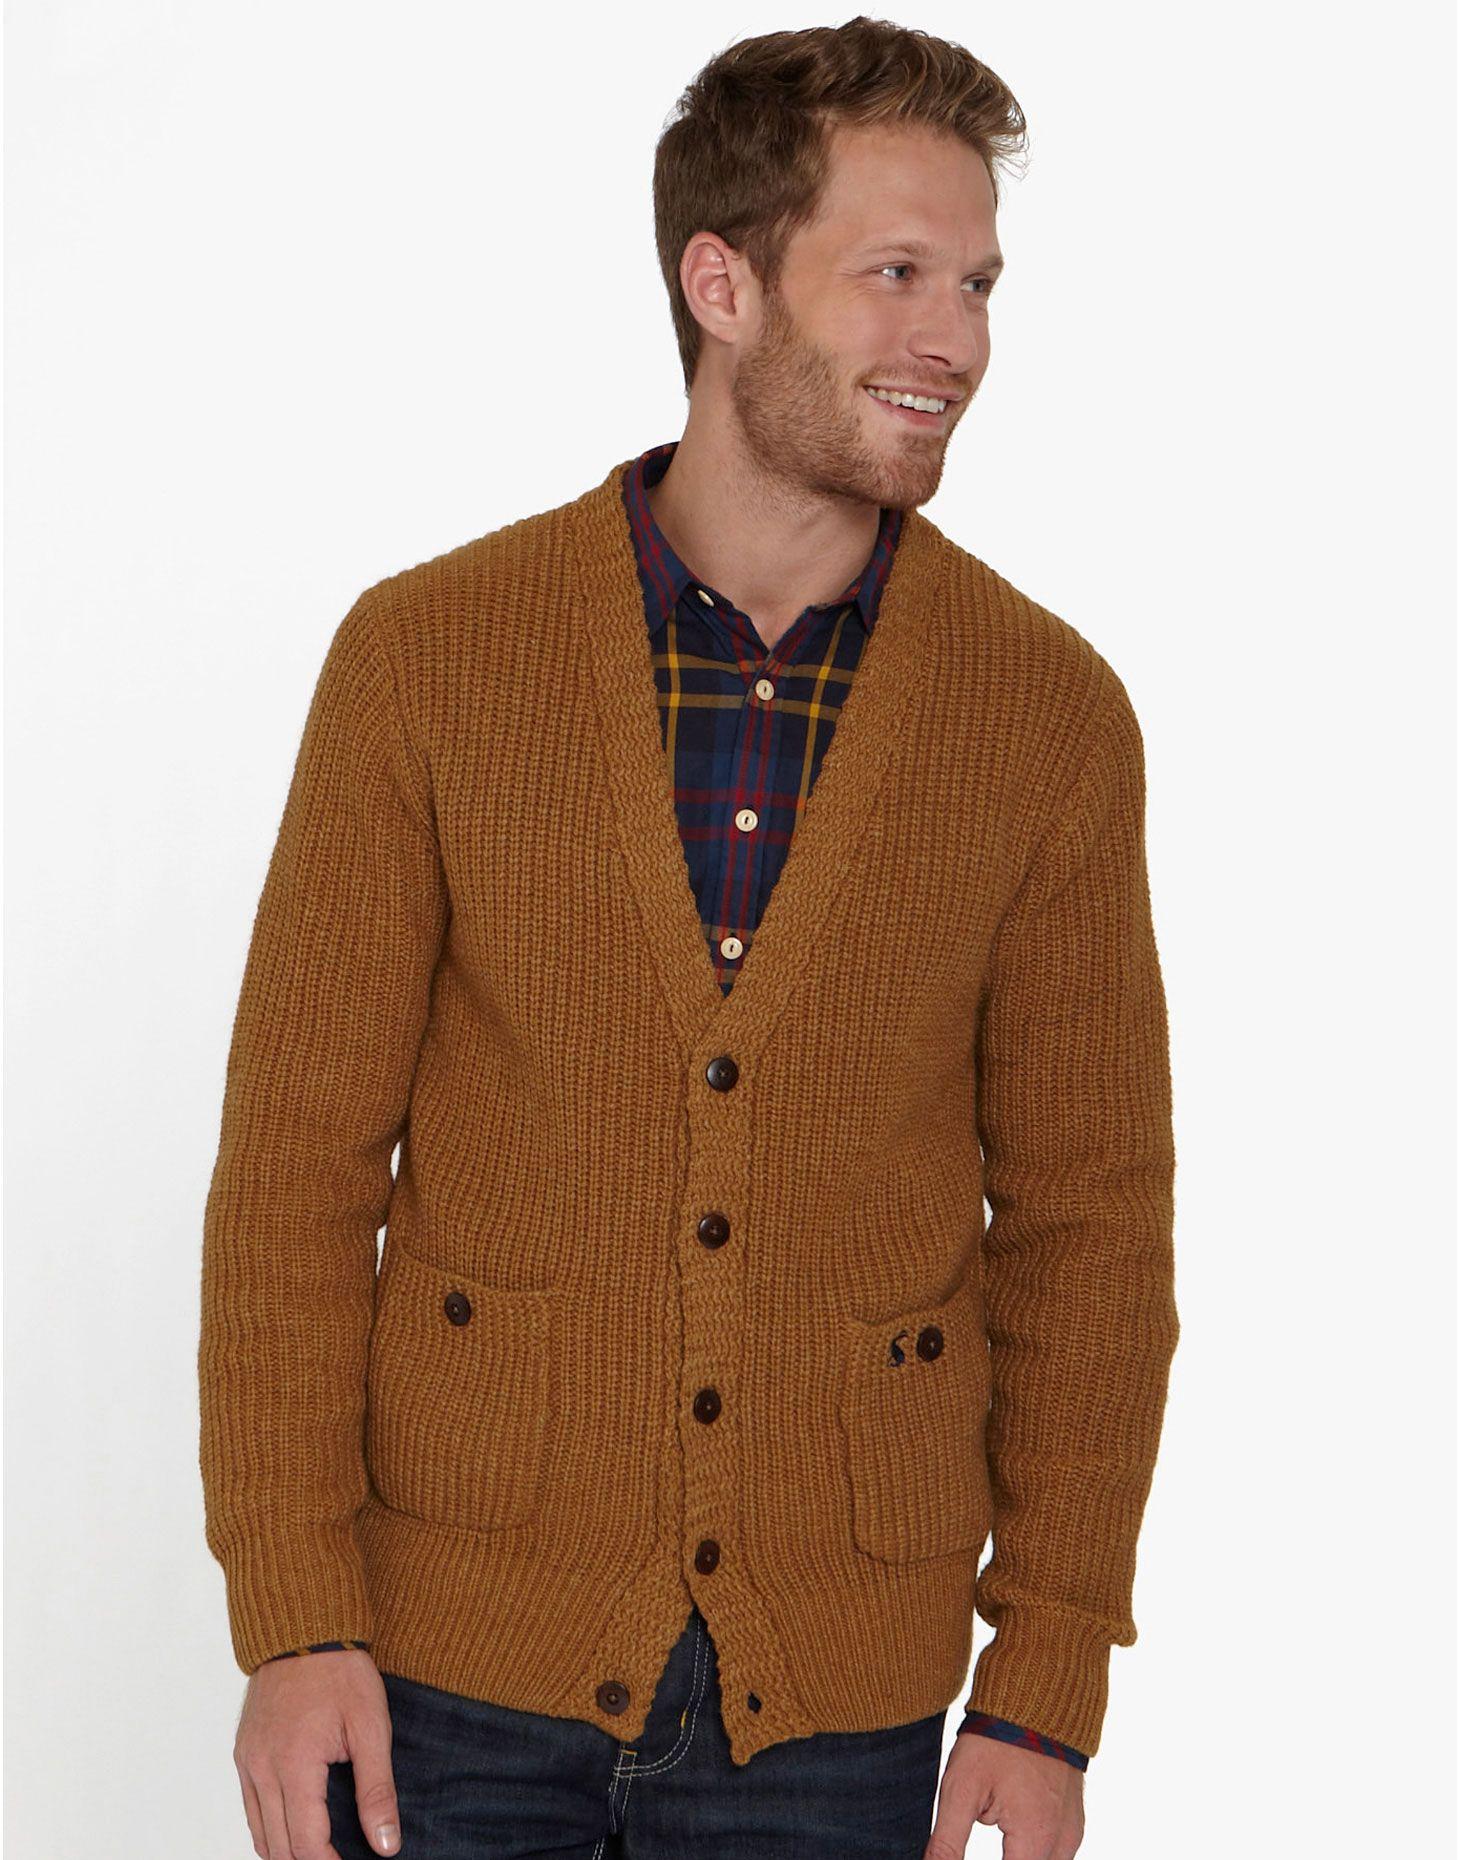 jouleswishlist ROXBURY Mens Homespun Cardigan FOR ME HUBBY! | My ...